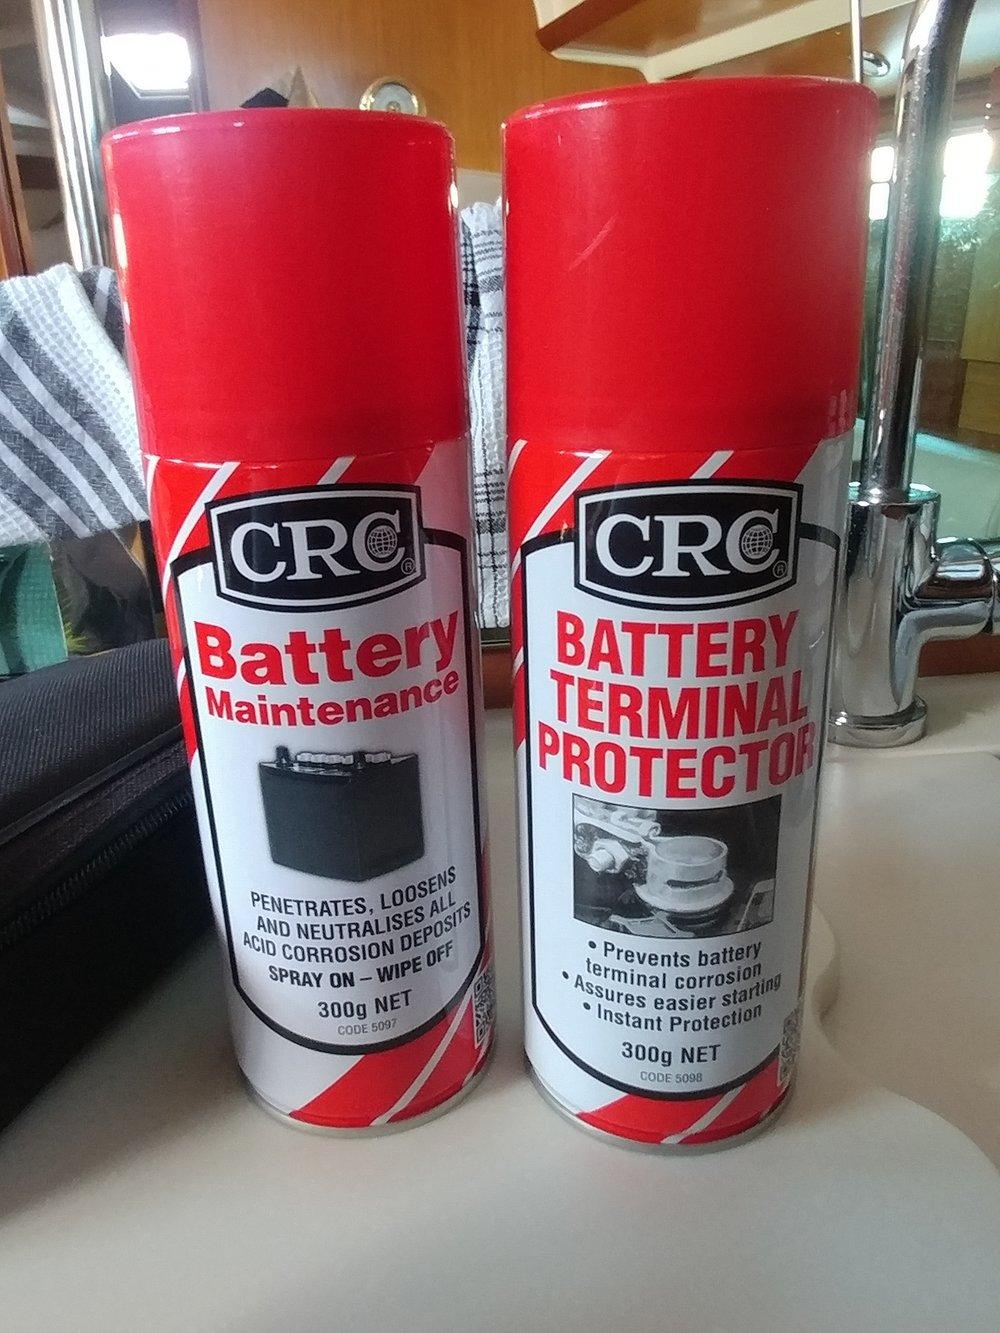 CRC Battery Maintenance spray, neutralises the acid corrosion.